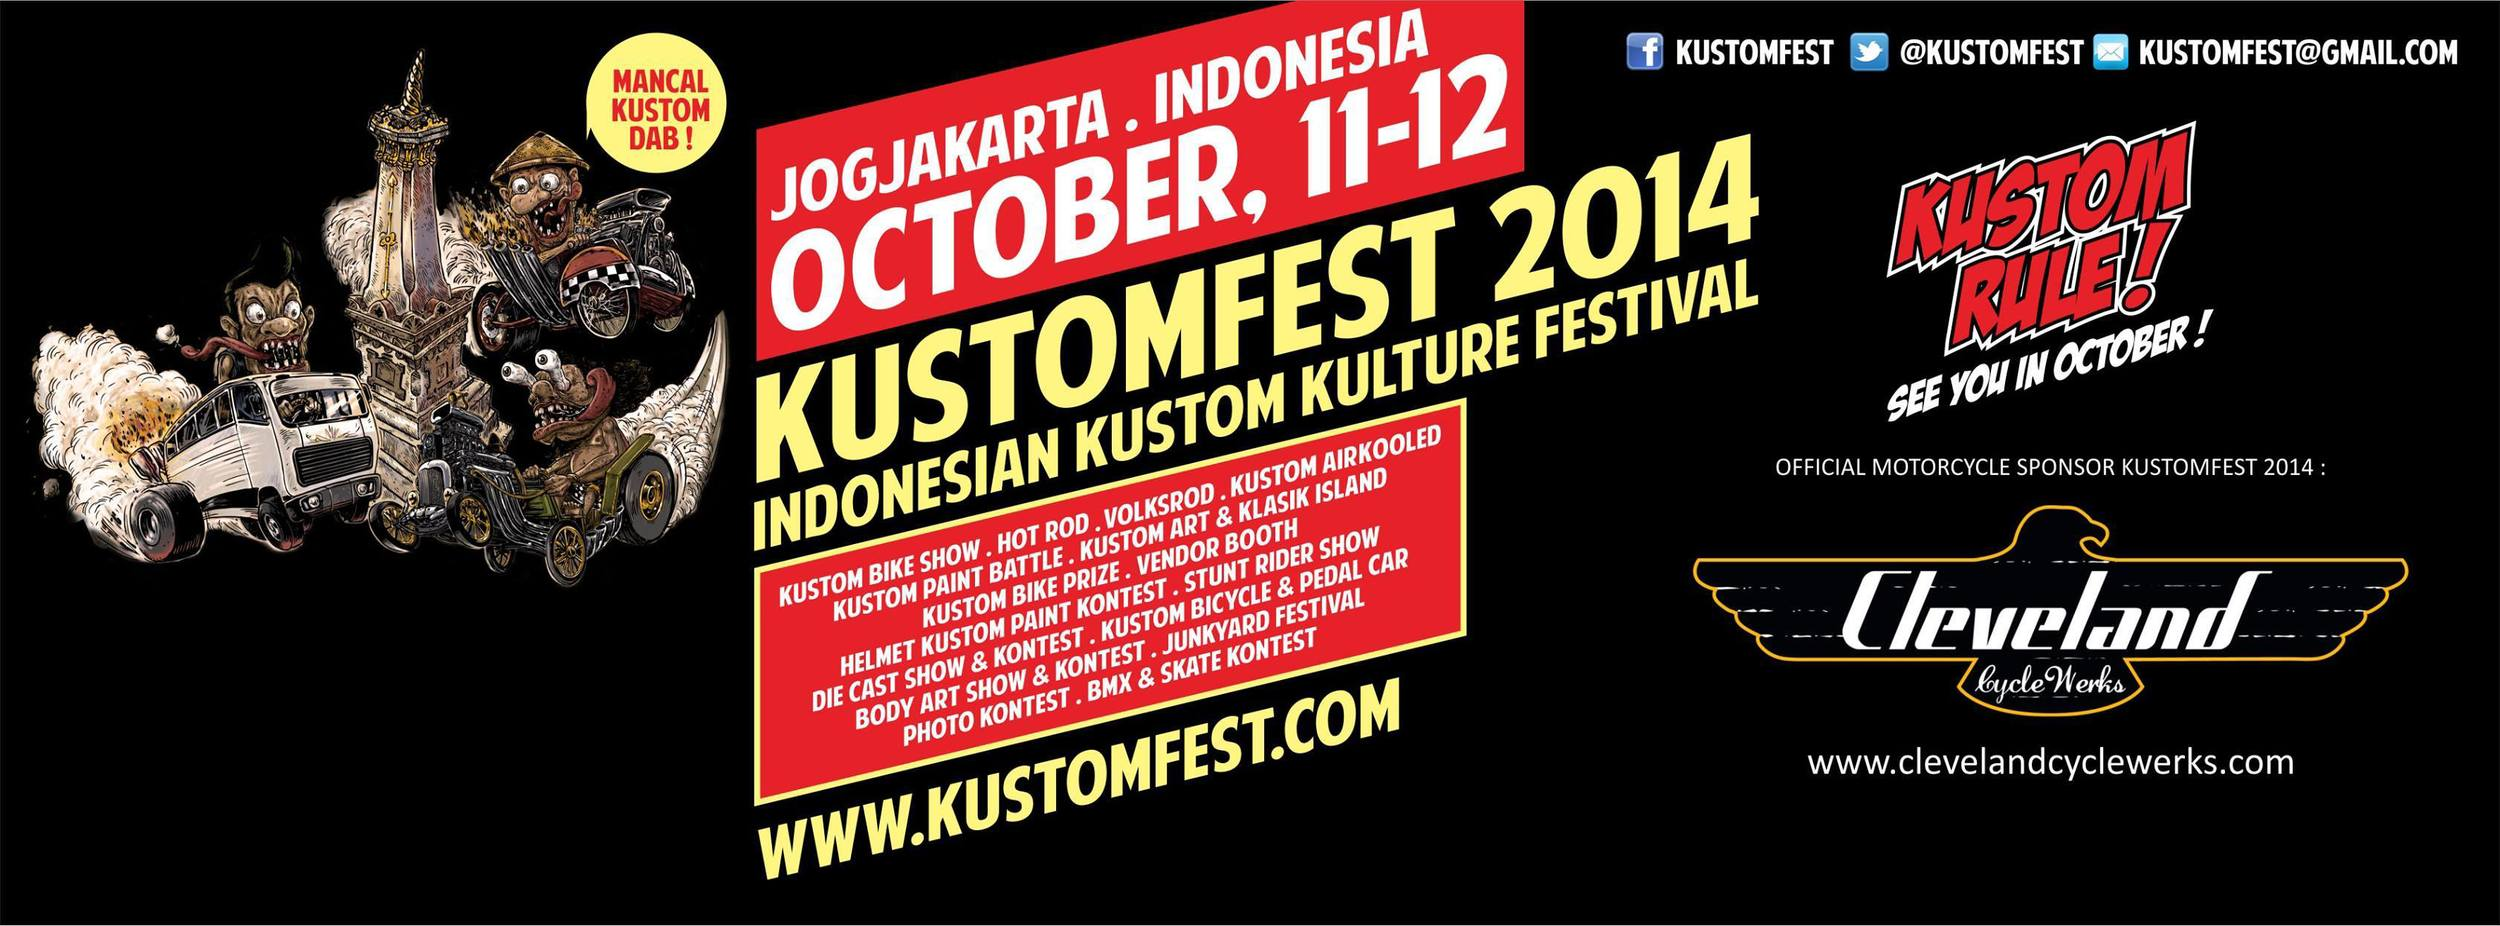 KustomFest 2014 CCW